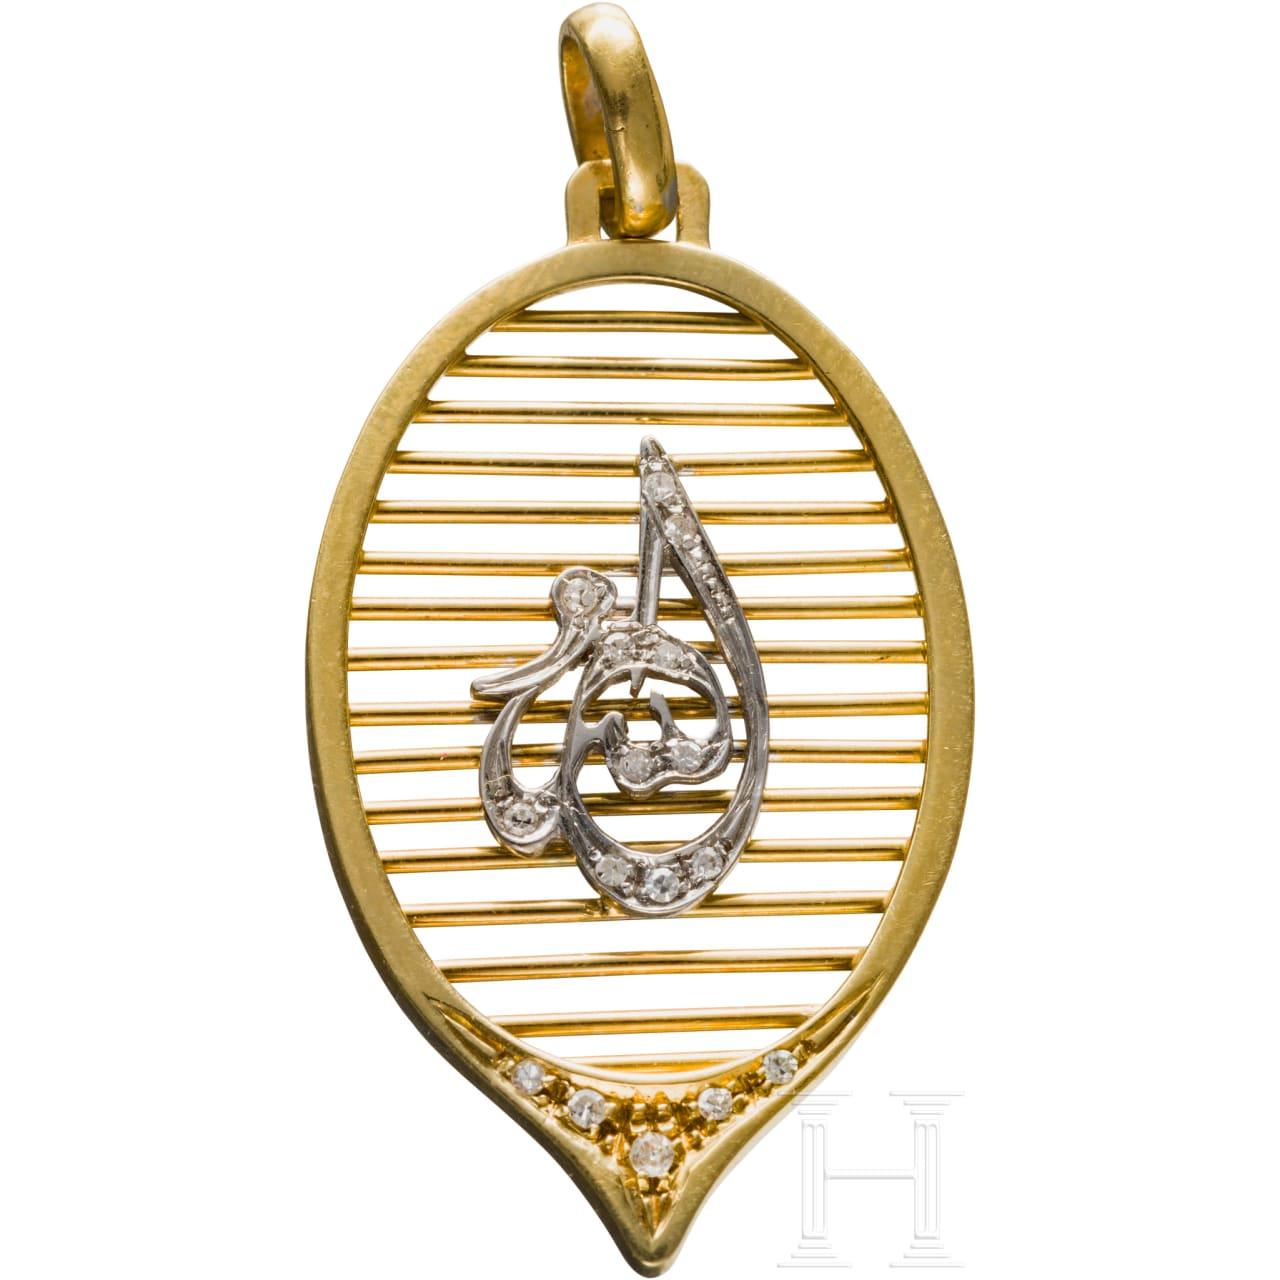 King Hussein I of Jordan (1935-99) - diamond-studded gold pendant